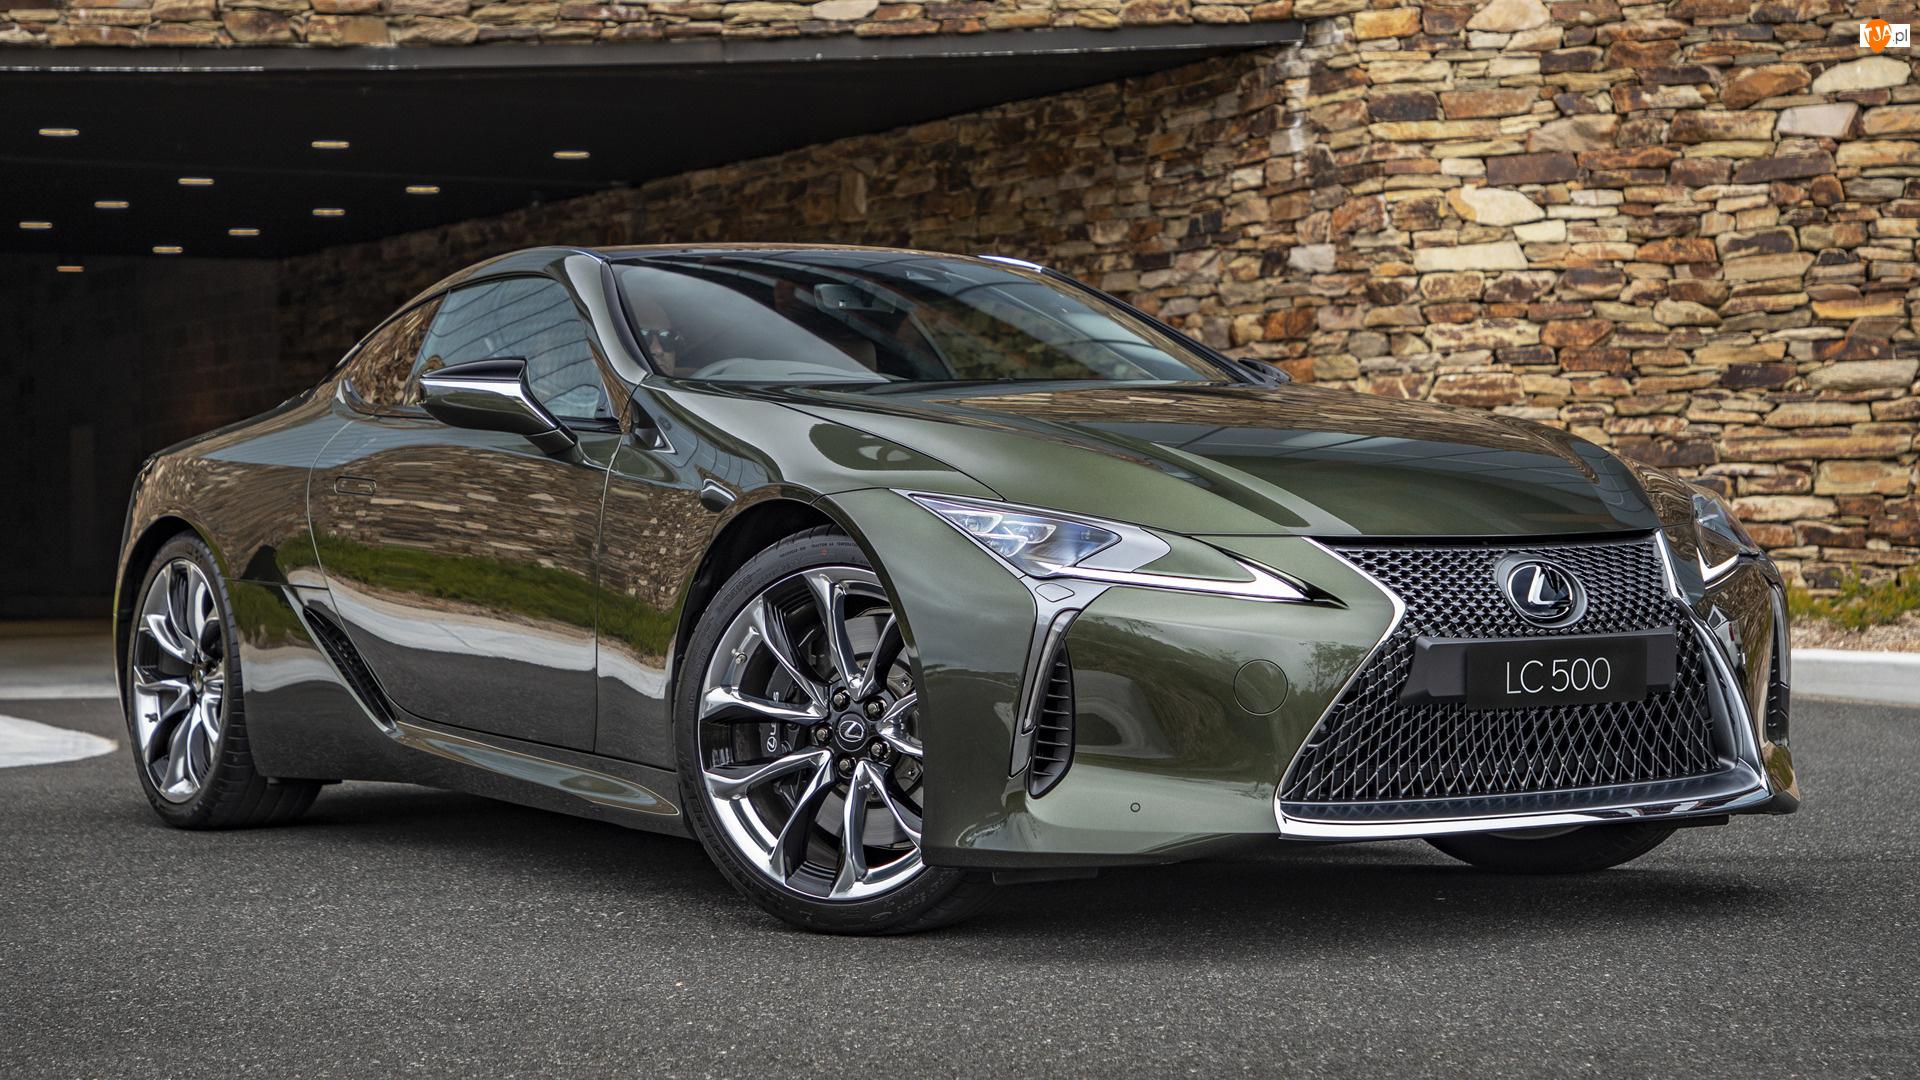 2020, Lexus LC 500 Inspiration